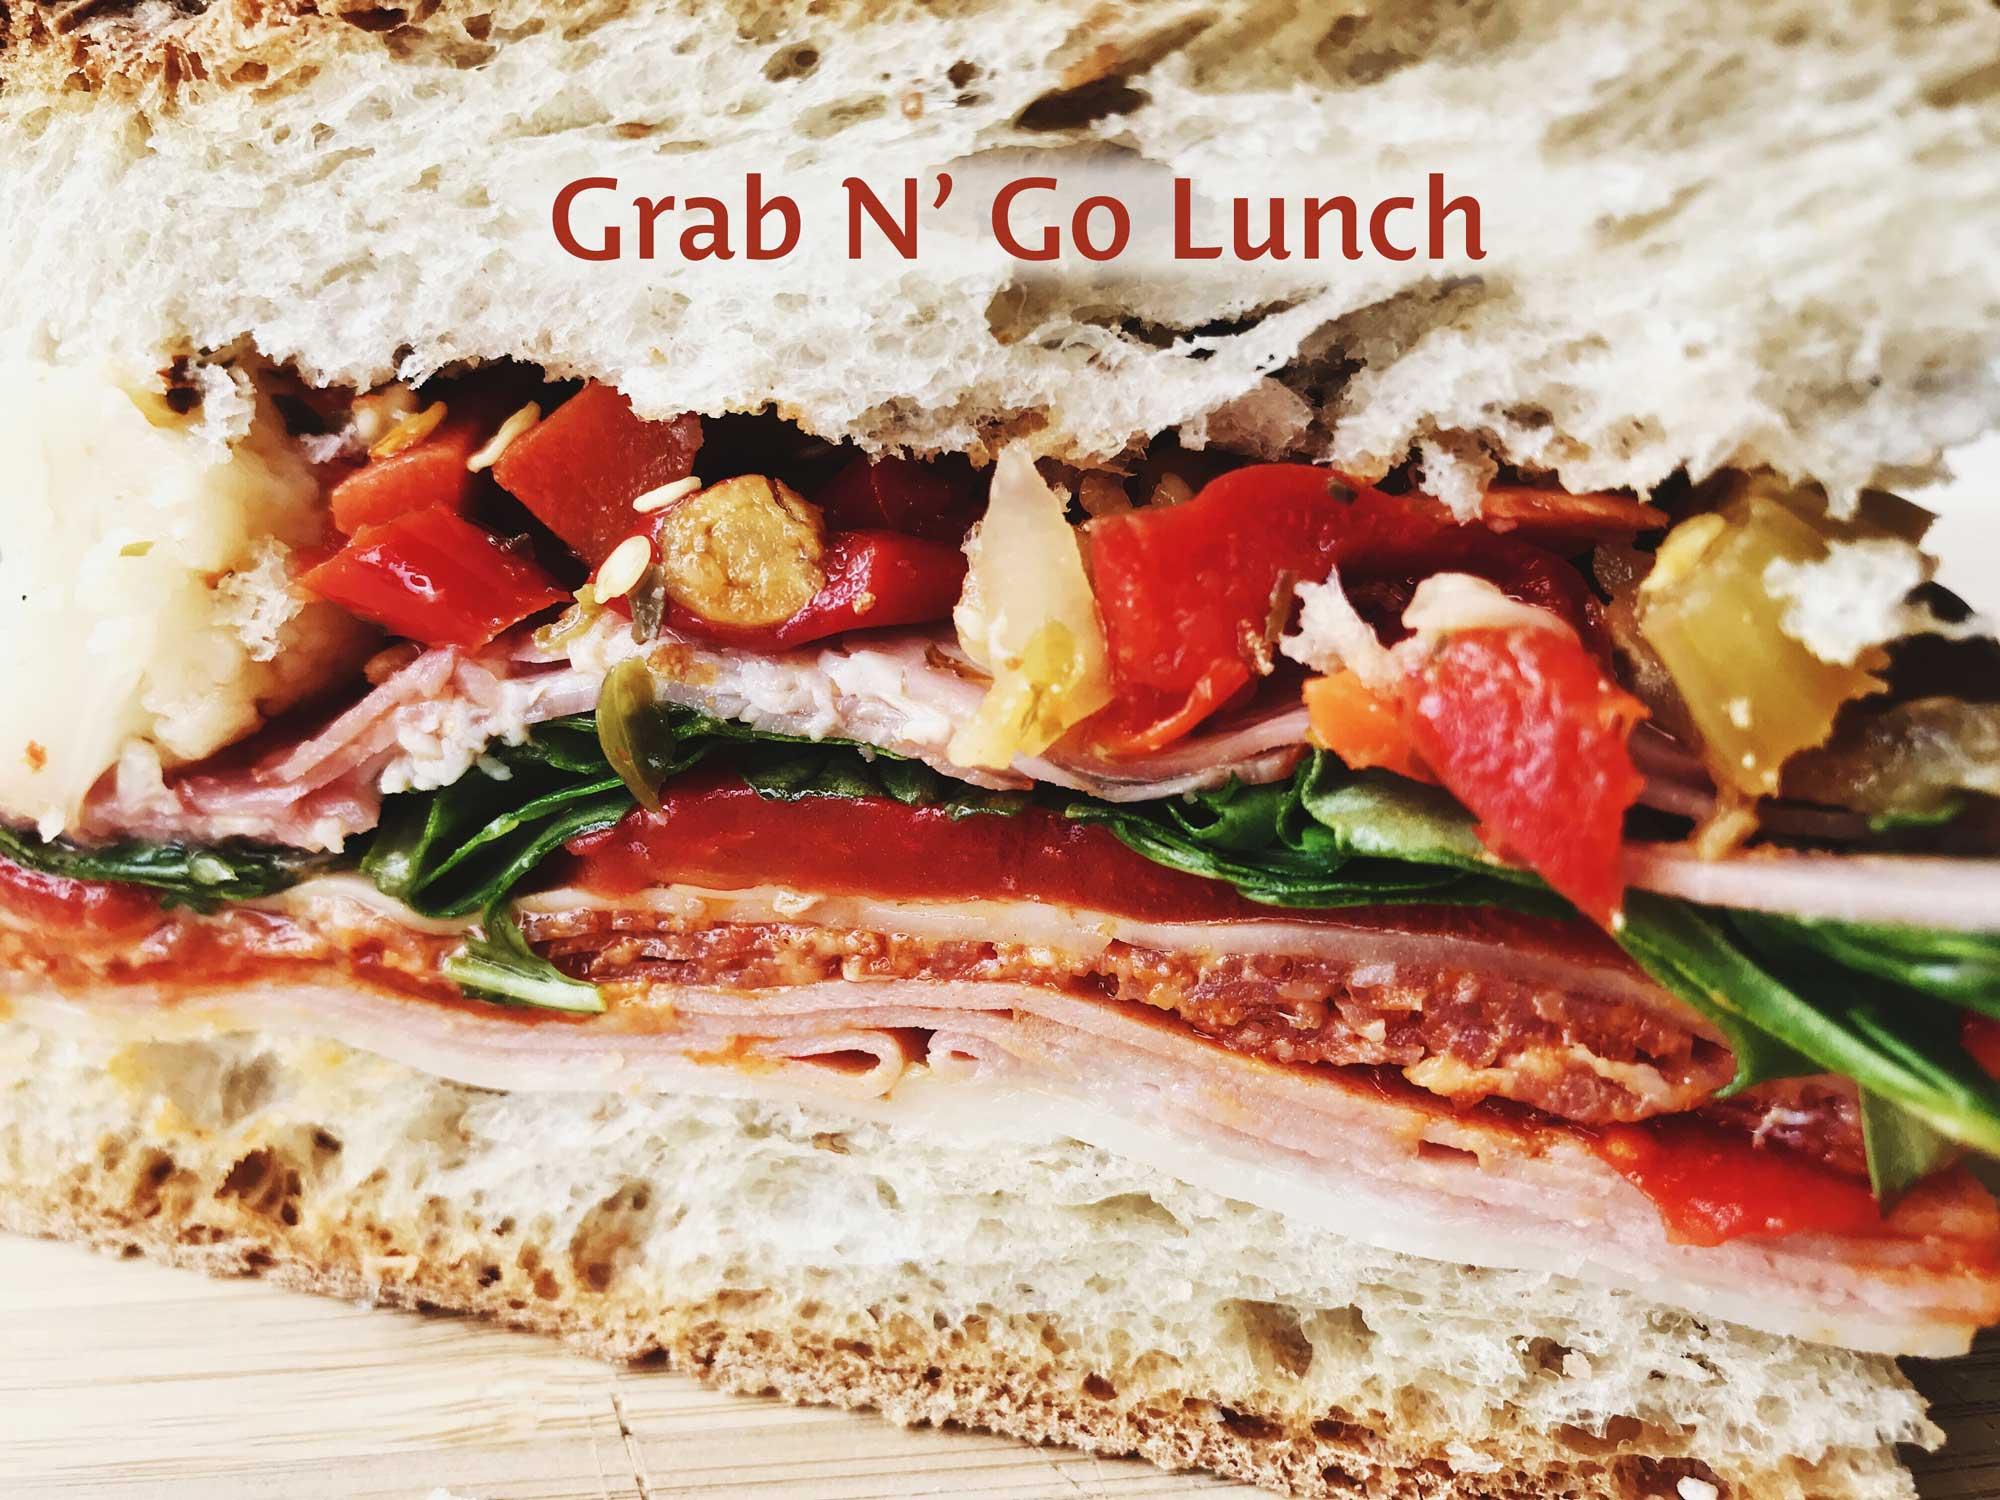 Order Grab N' Go Lunch